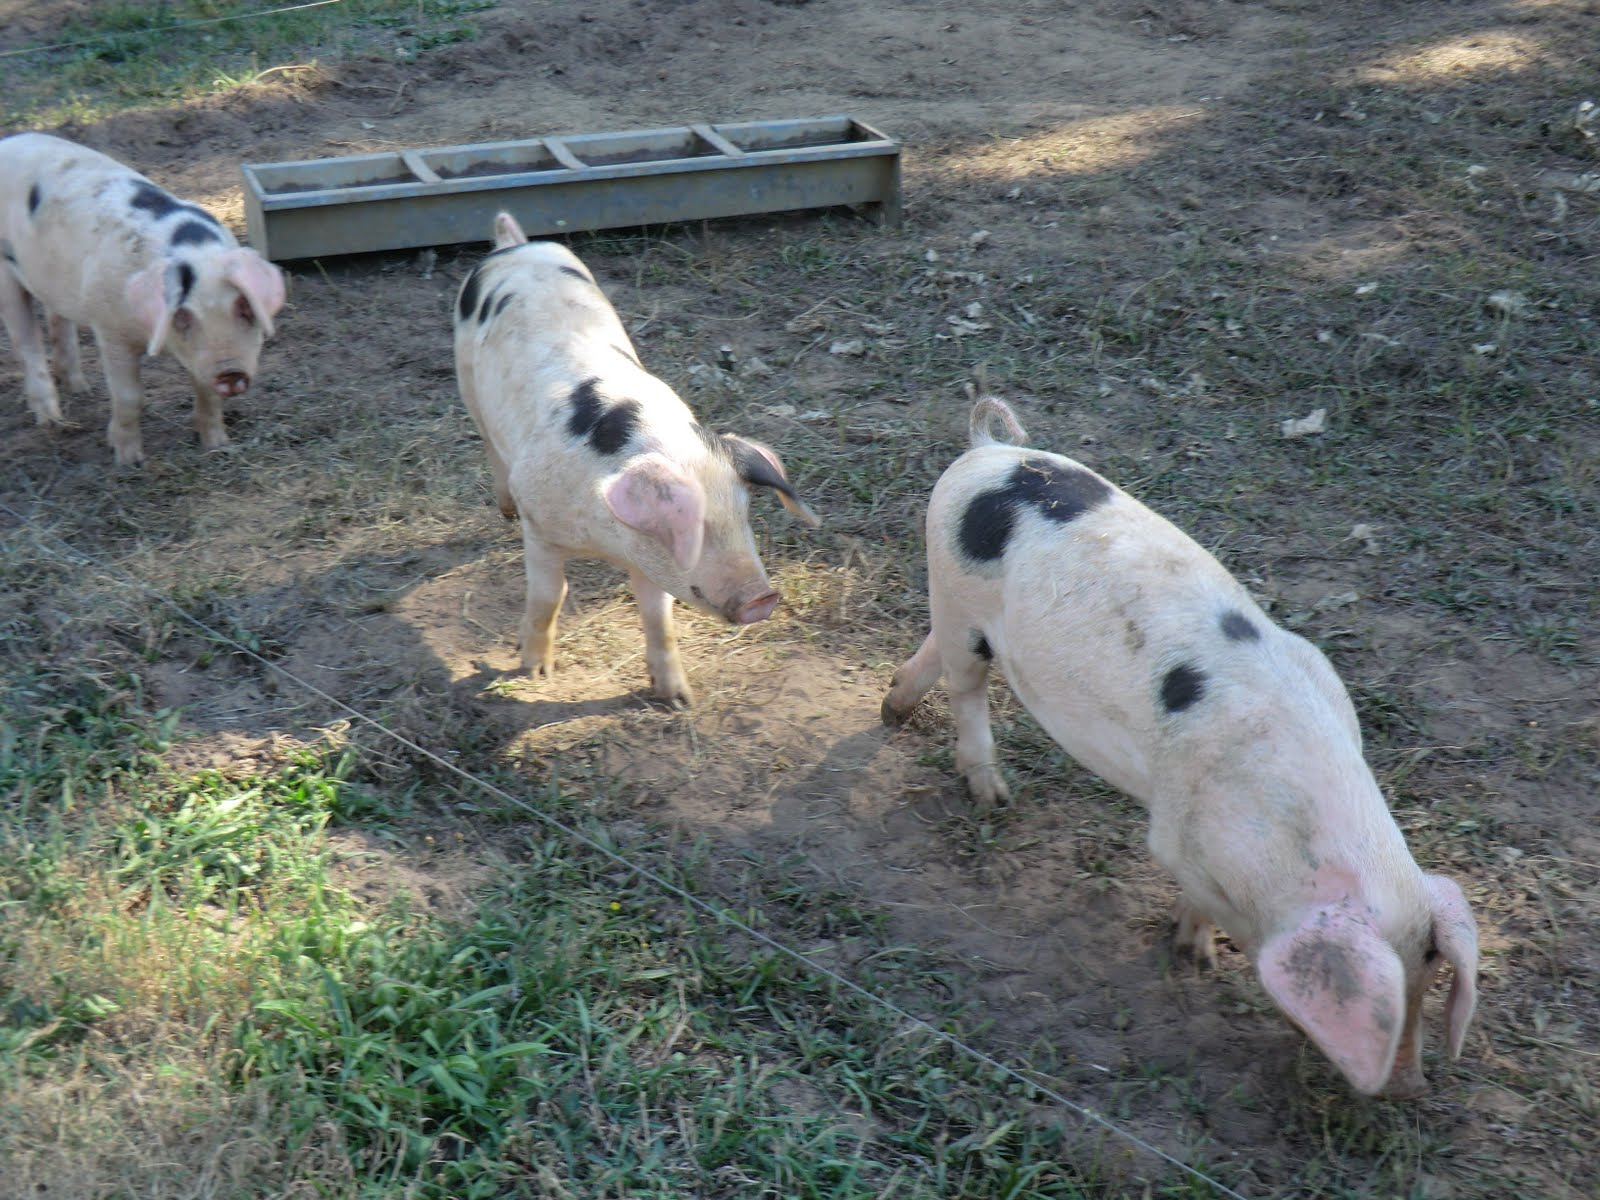 CIMG8495 Please don't order the pork chop!